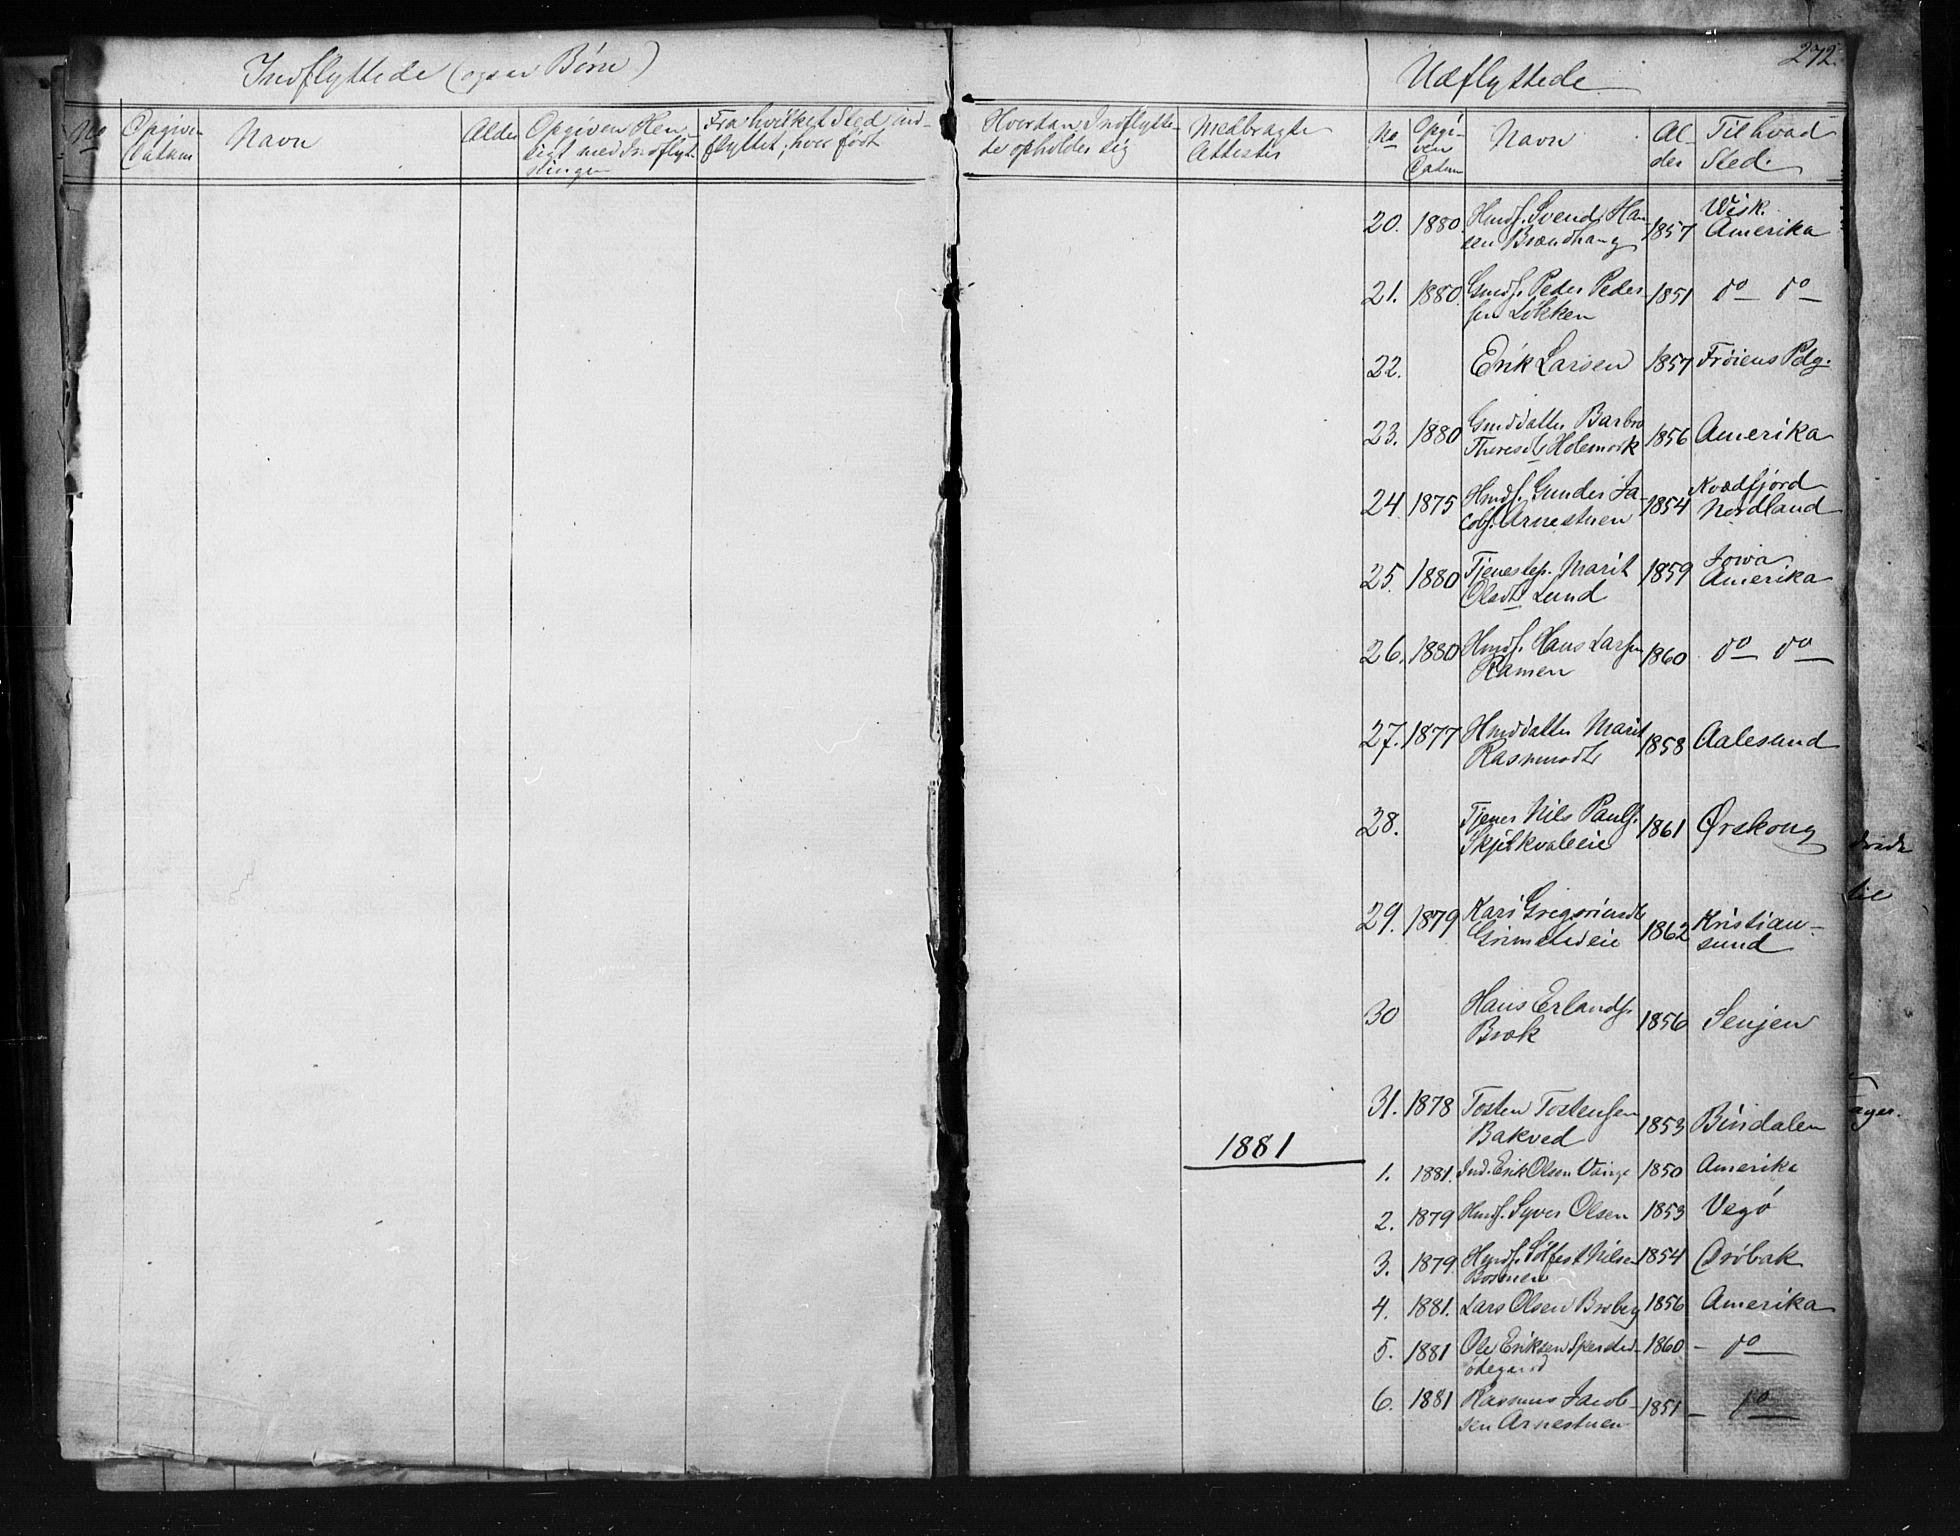 SAH, Skjåk prestekontor, Klokkerbok nr. 1, 1865-1893, s. 272